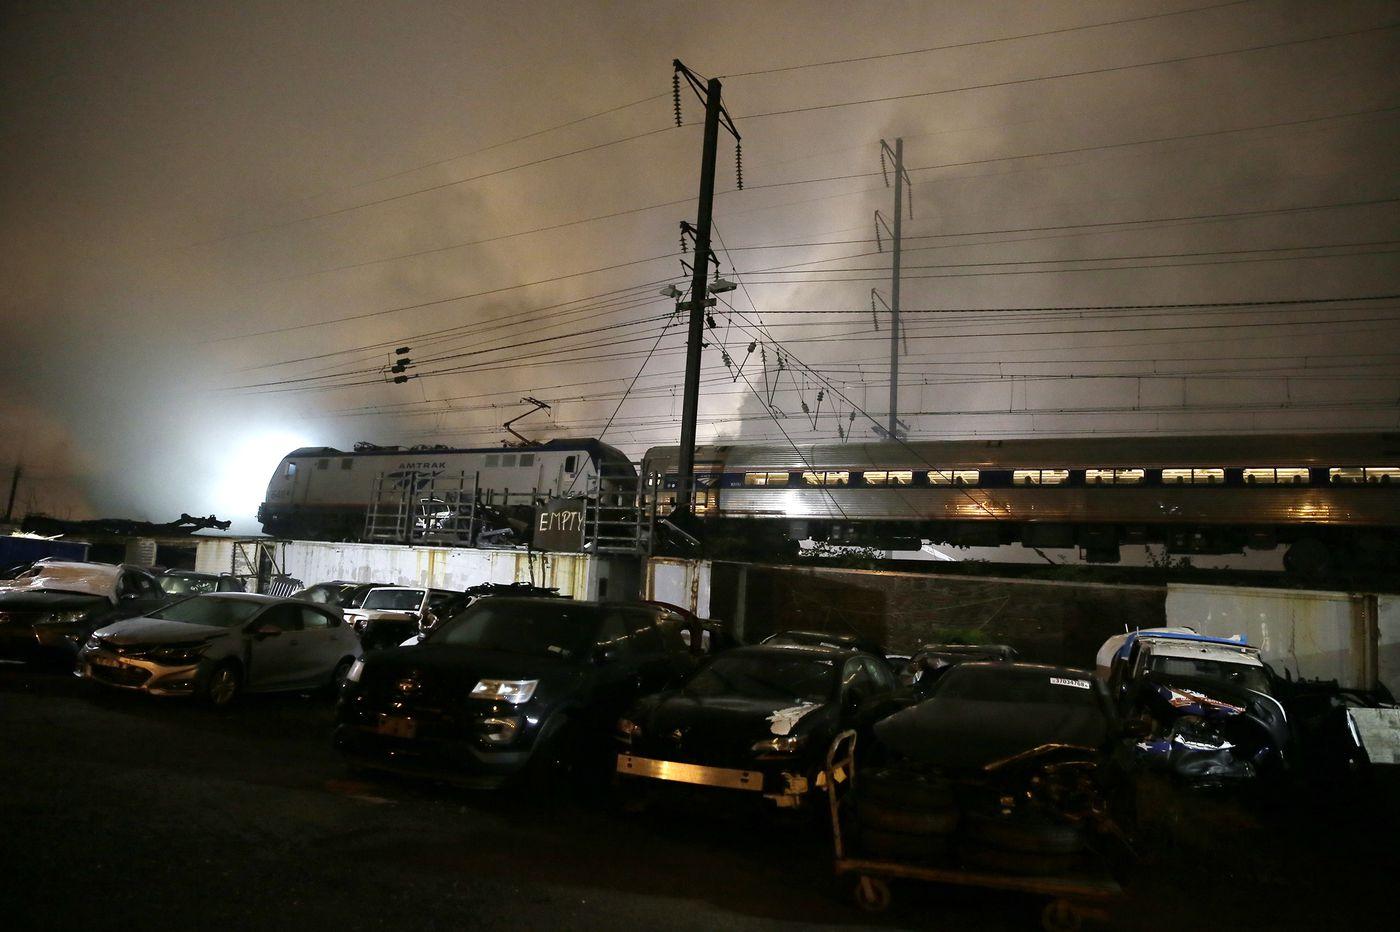 Amtrak, SEPTA resume full rail service through Frankford after junkyard fire